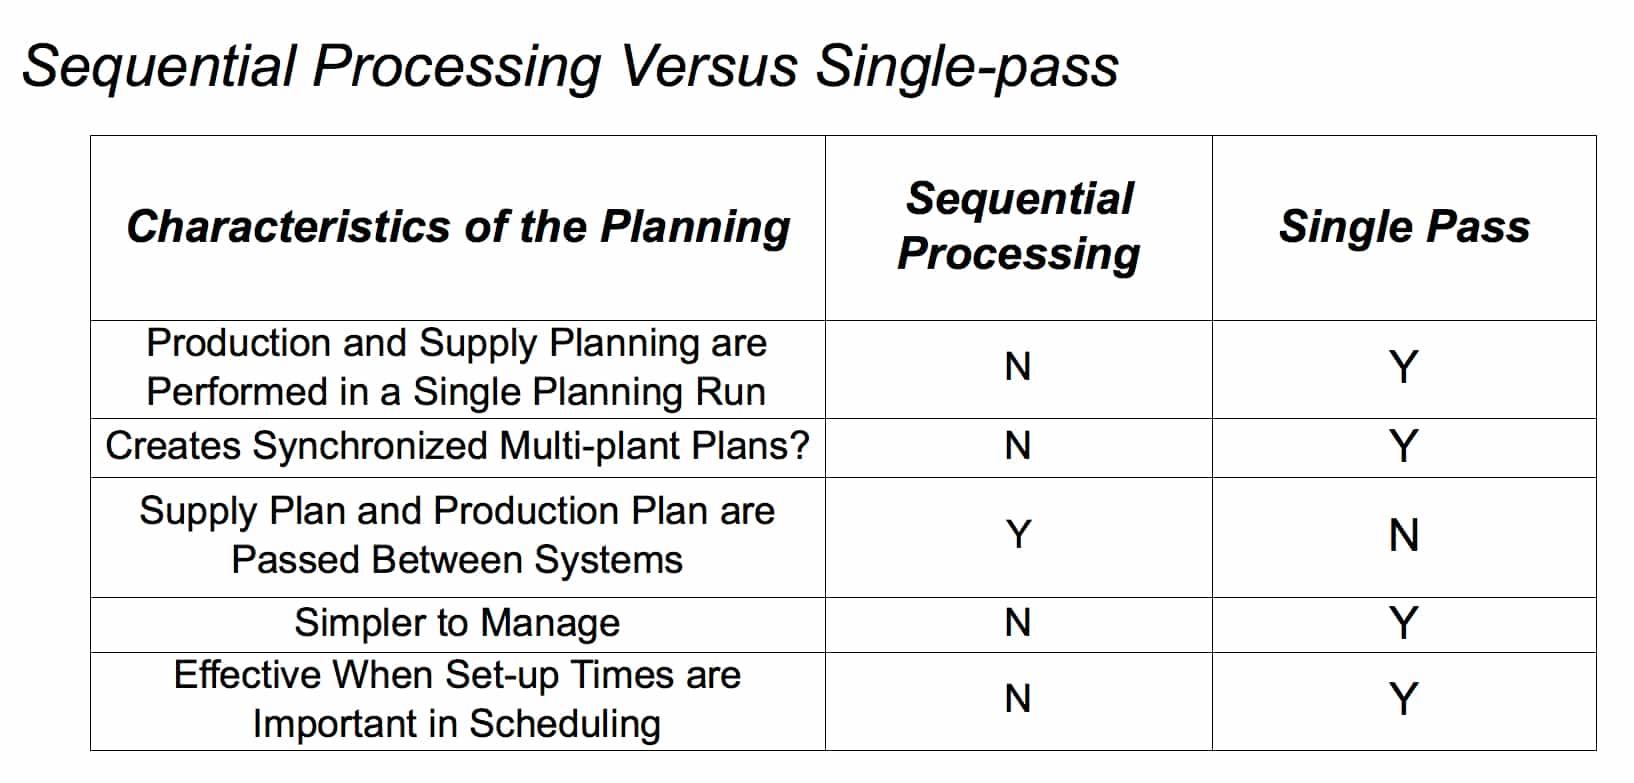 Single Pass Versus Sequential Processing